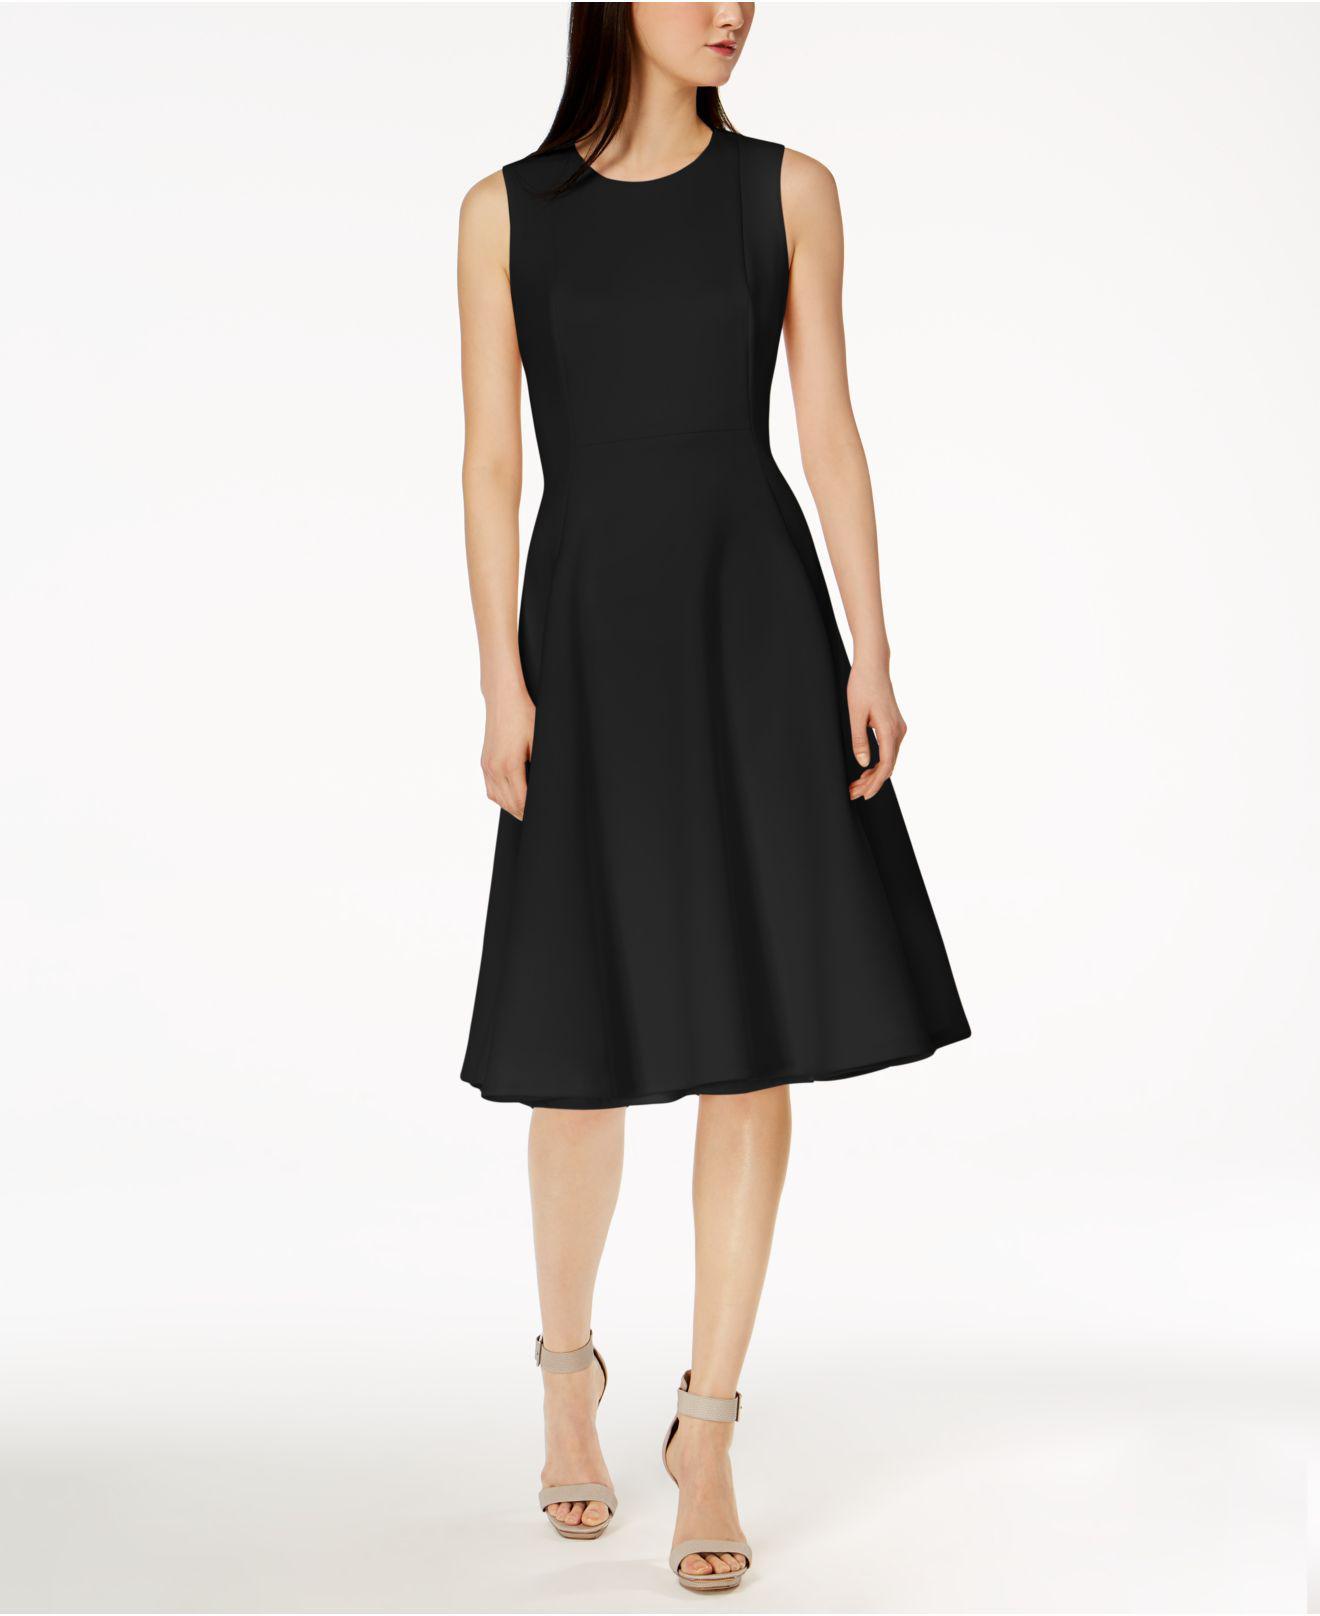 Lyst - Calvin Klein 205W39Nyc Scuba Midi Fit & Flare Dress in Black